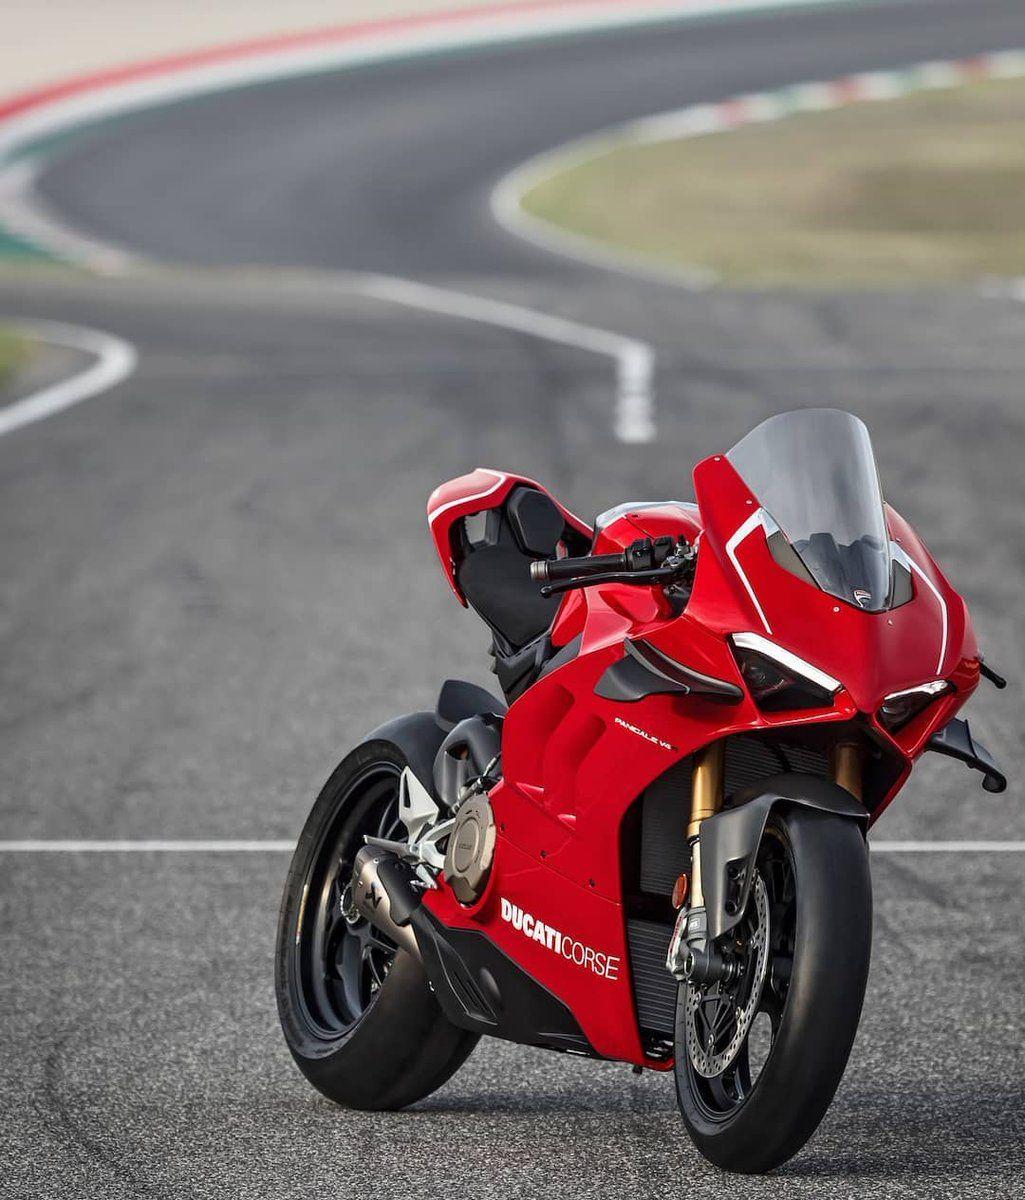 Ducati Motorbike, Ducati Superbike, Moto Ducati